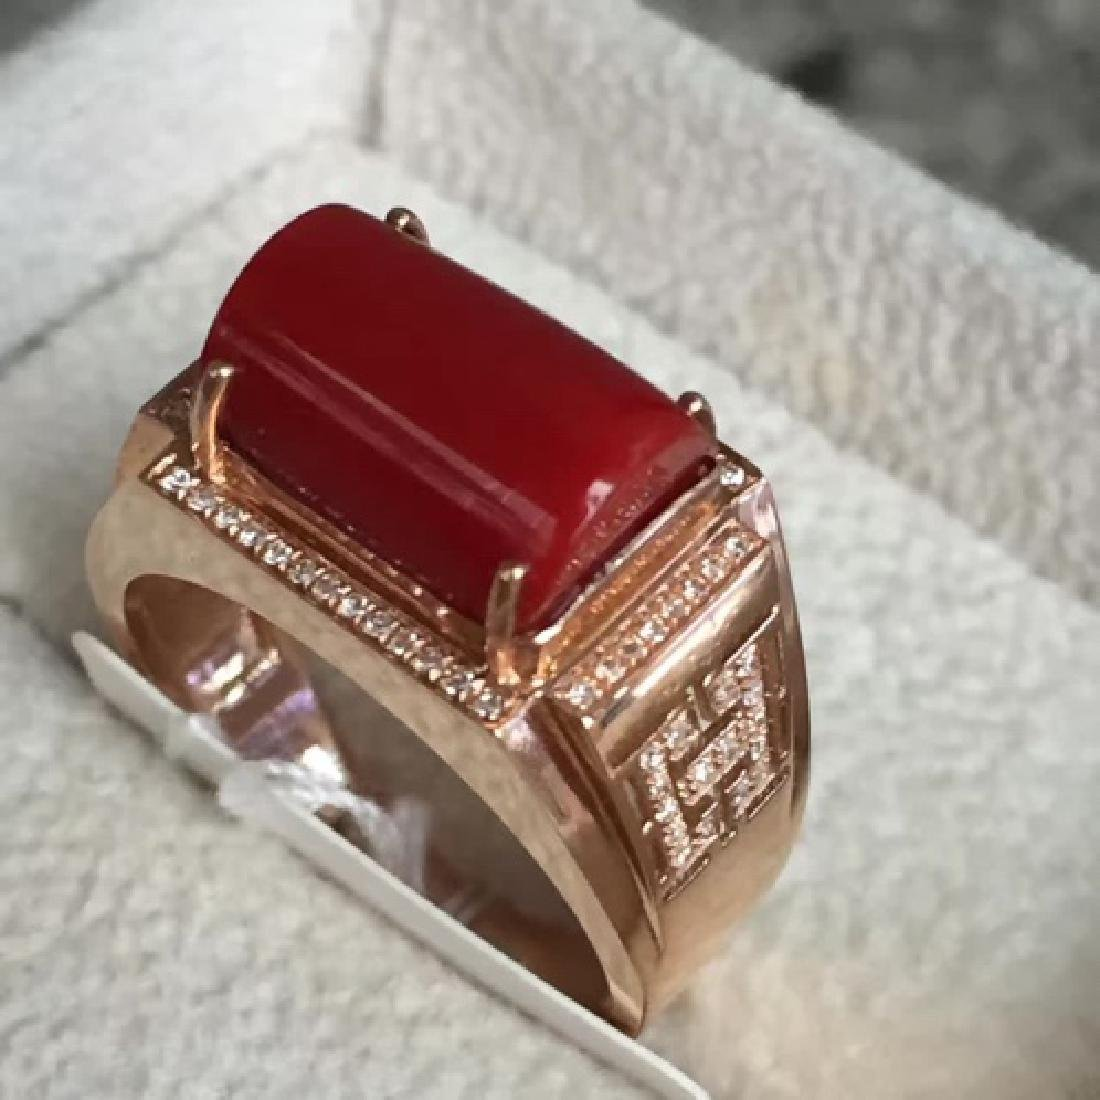 18K AKA MALE RING WITH DIAMOND - 3